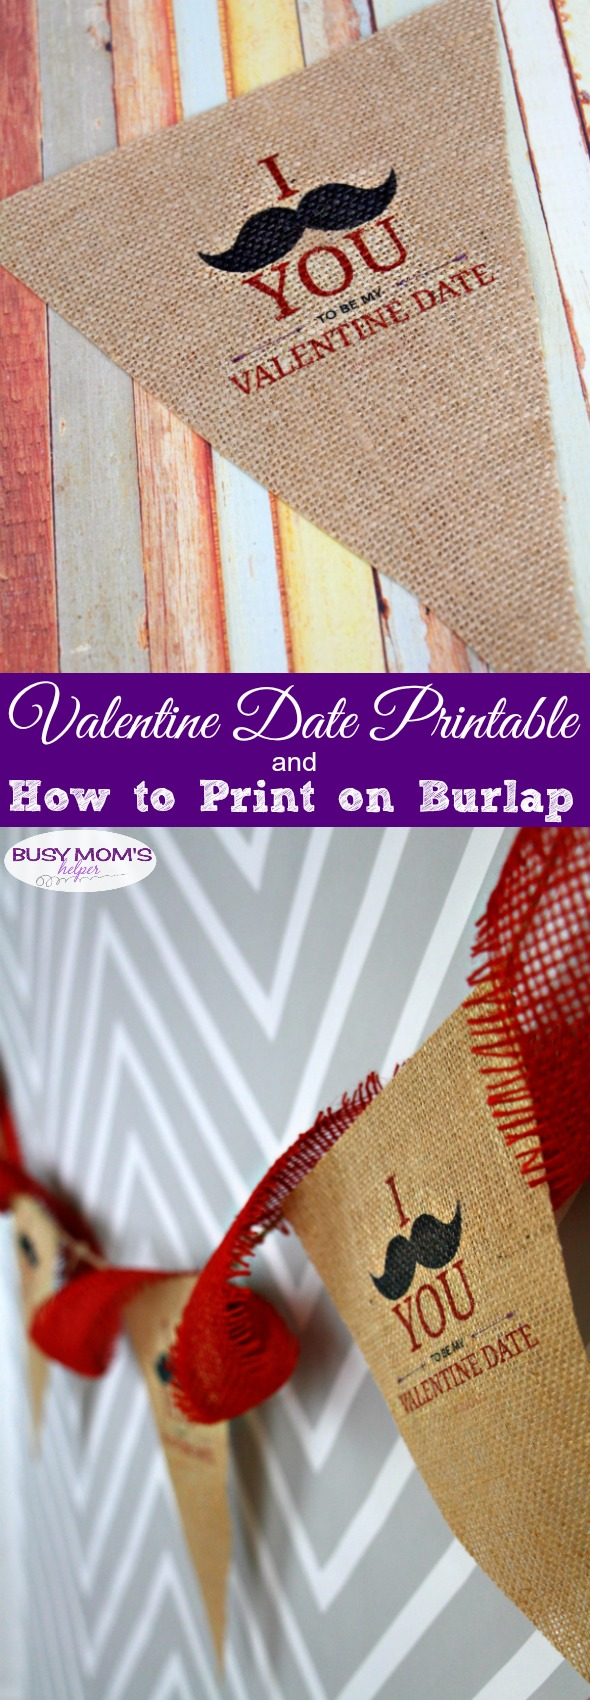 How to Print on Burlap & Valentine Date Invitation Printable #ad #burlapfabric #craft #diy #printable #valentines